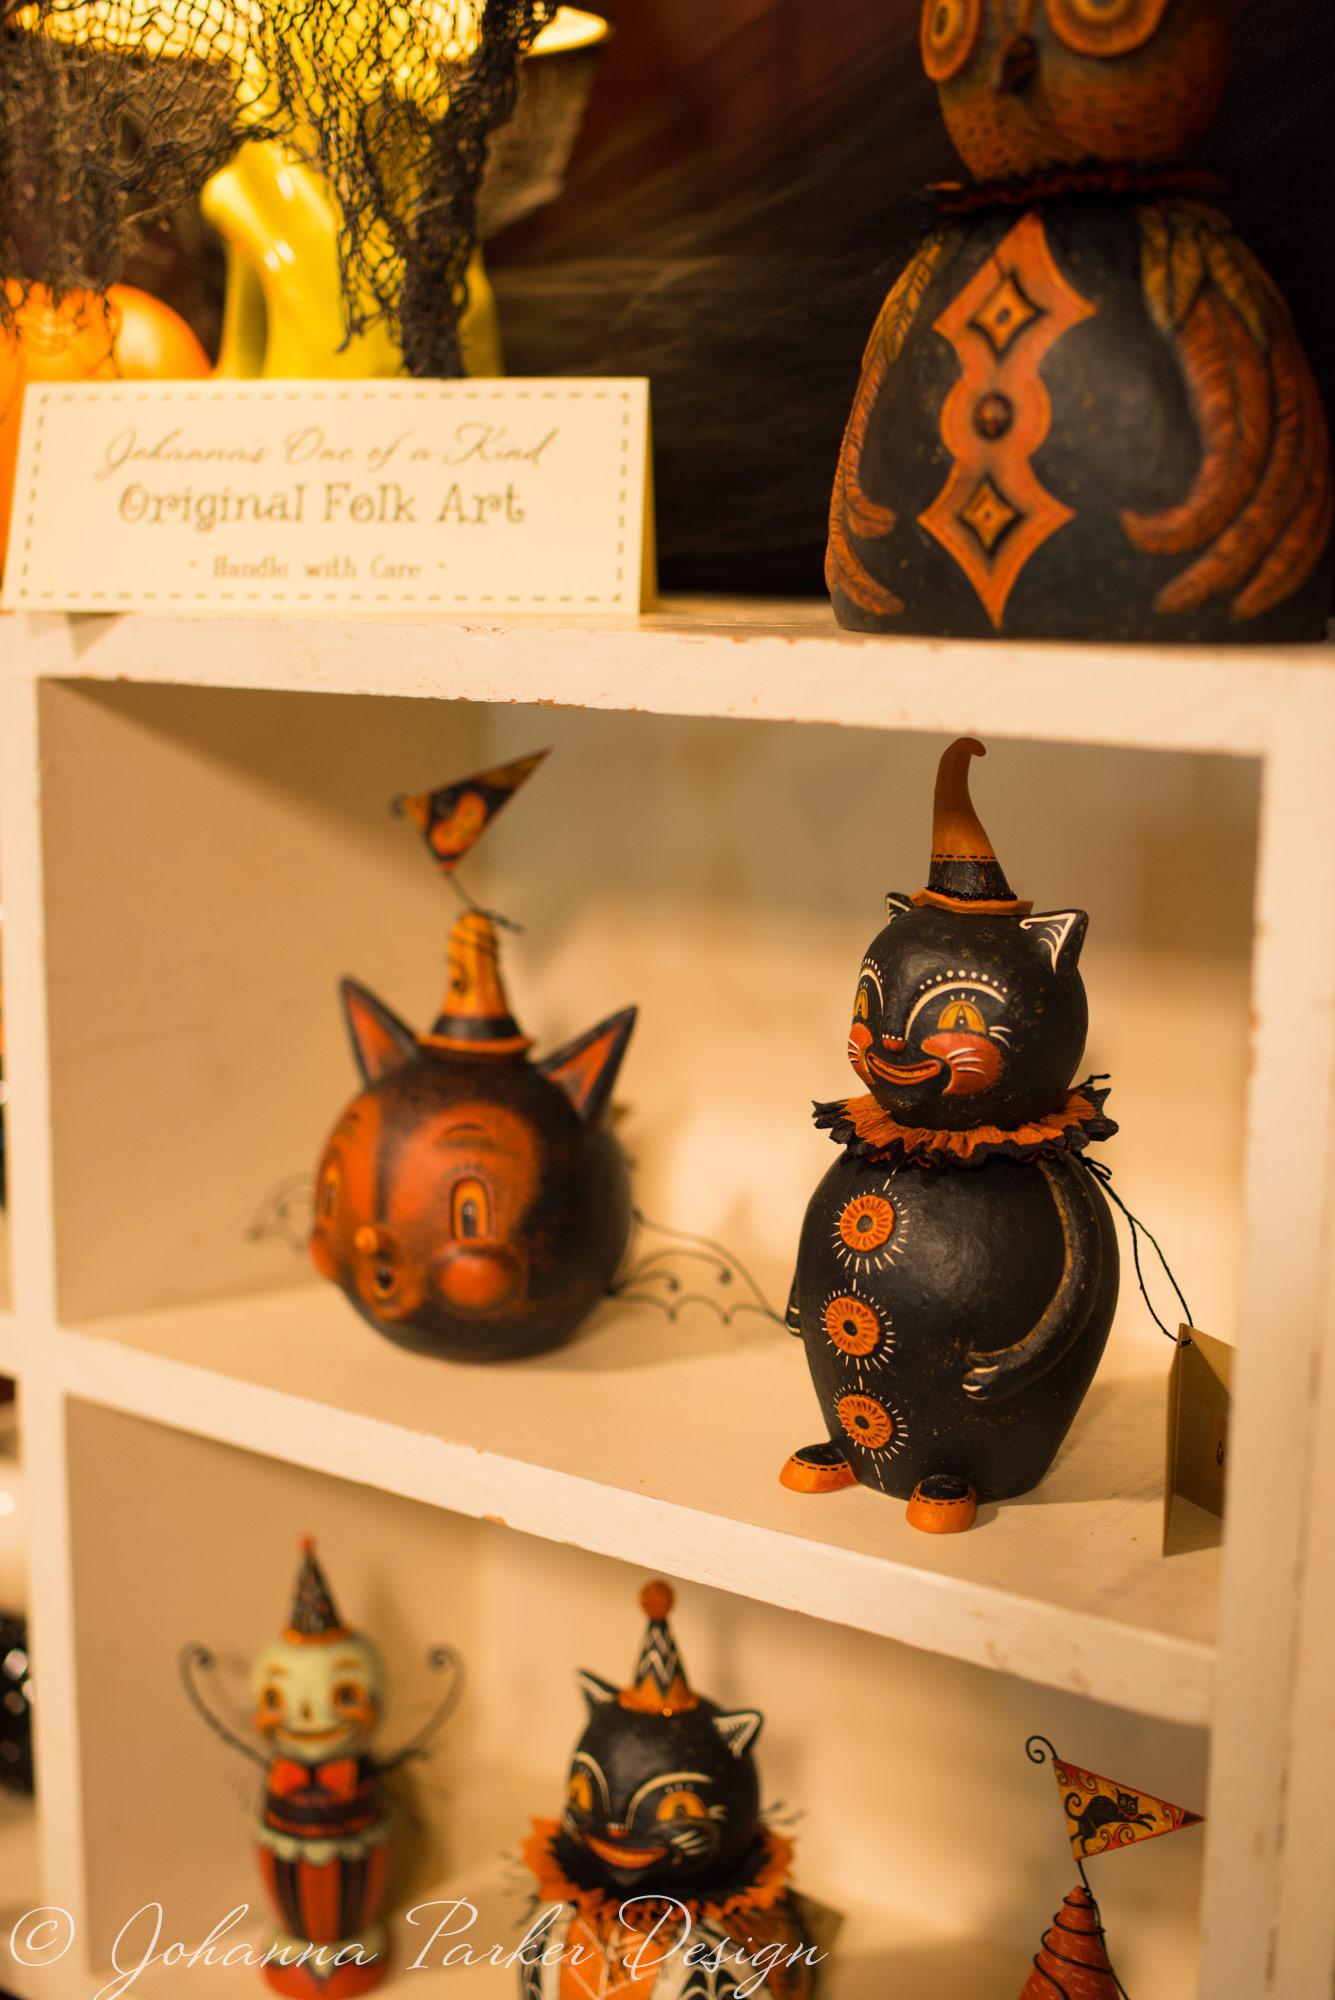 Johanna-Parker-Halloween-black-cat-bat-folk-art.jpg